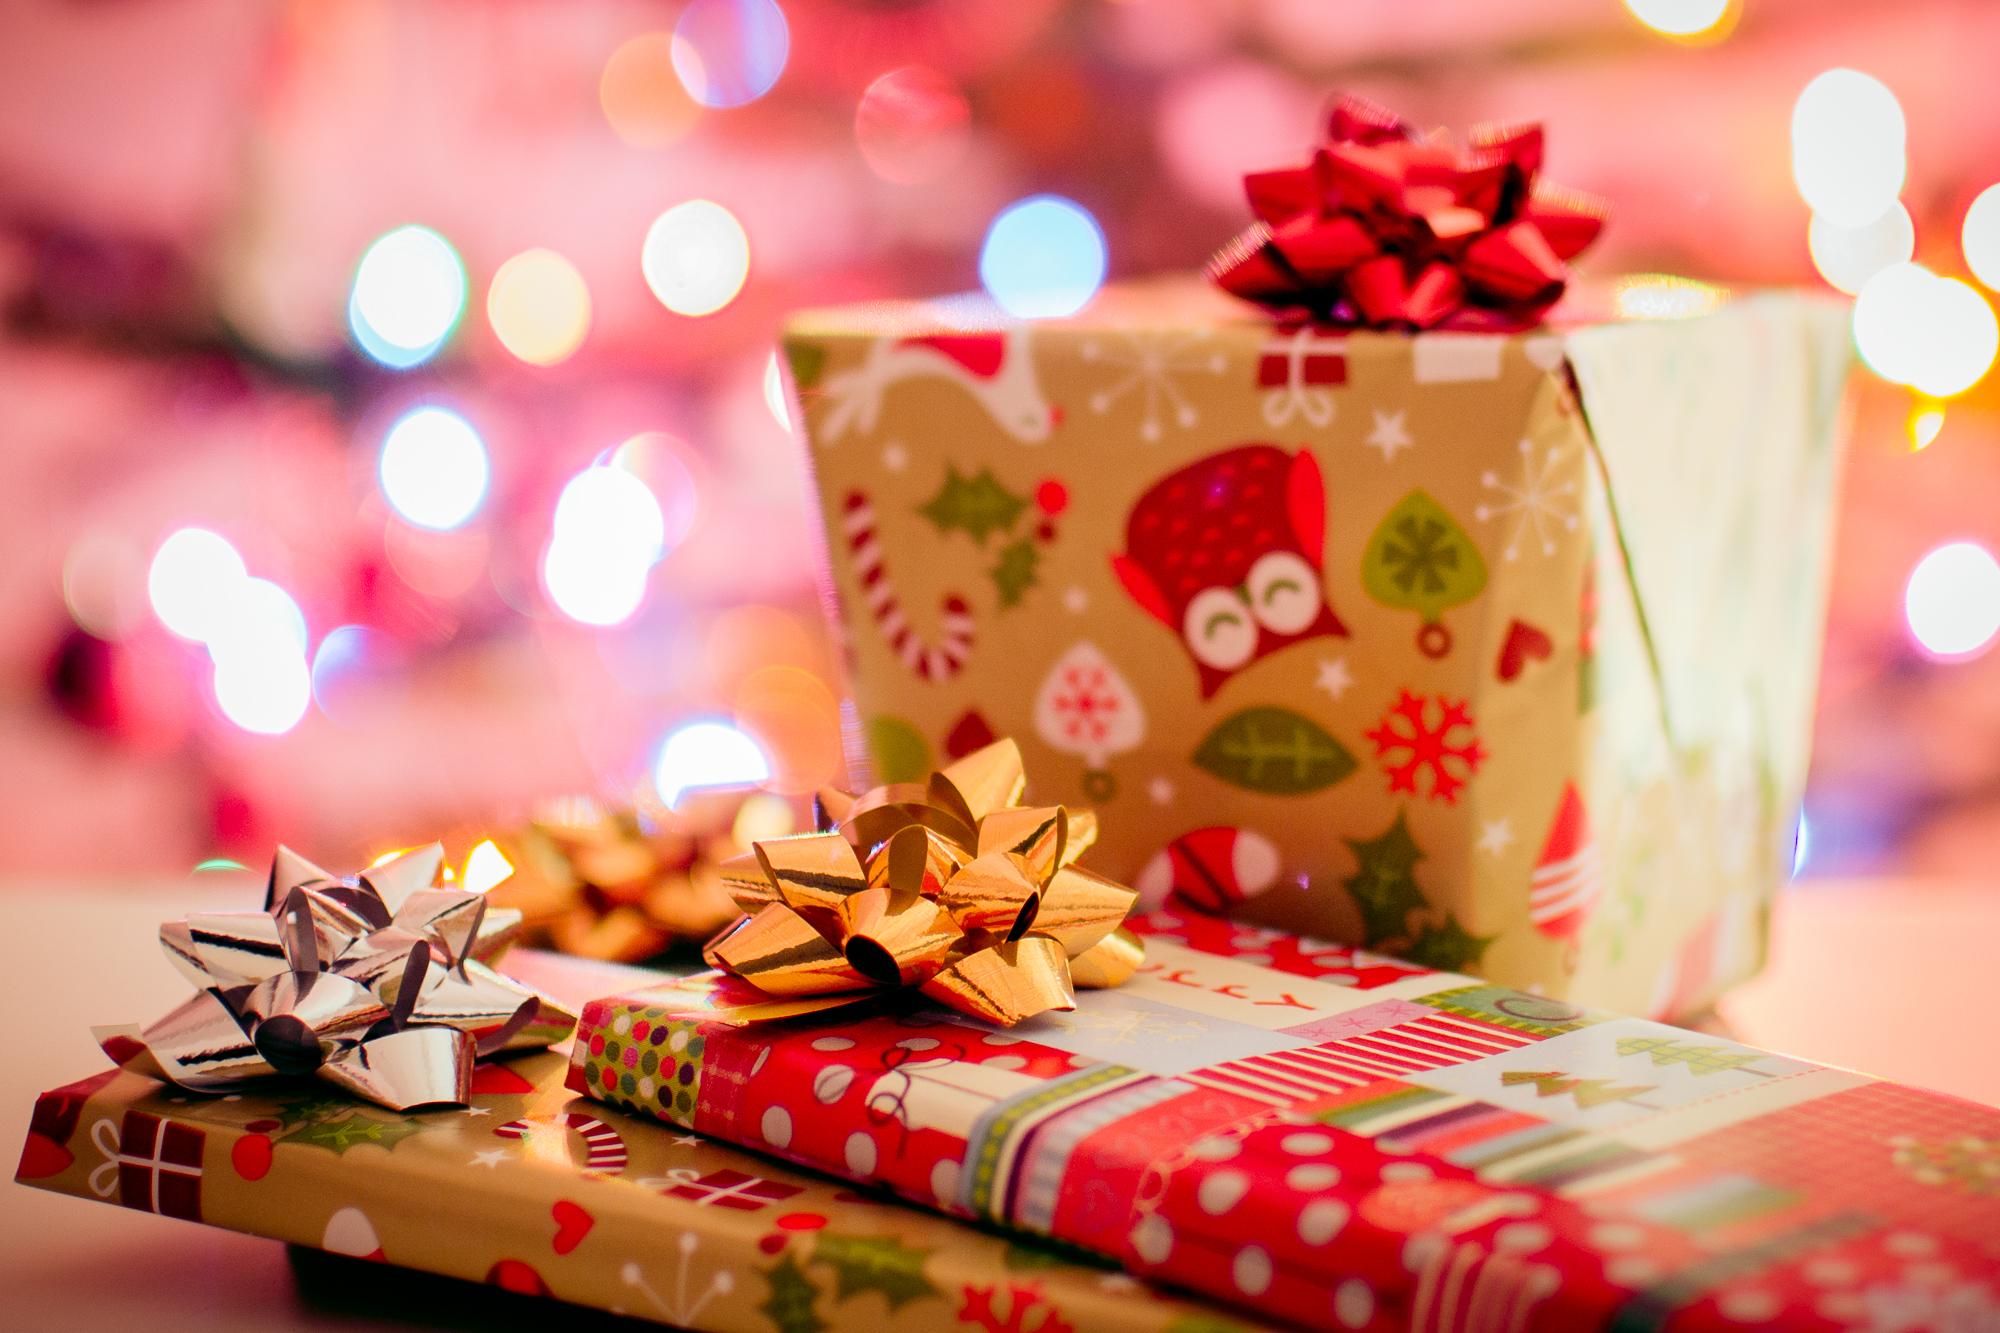 KIWI's Christmas Toy Drive